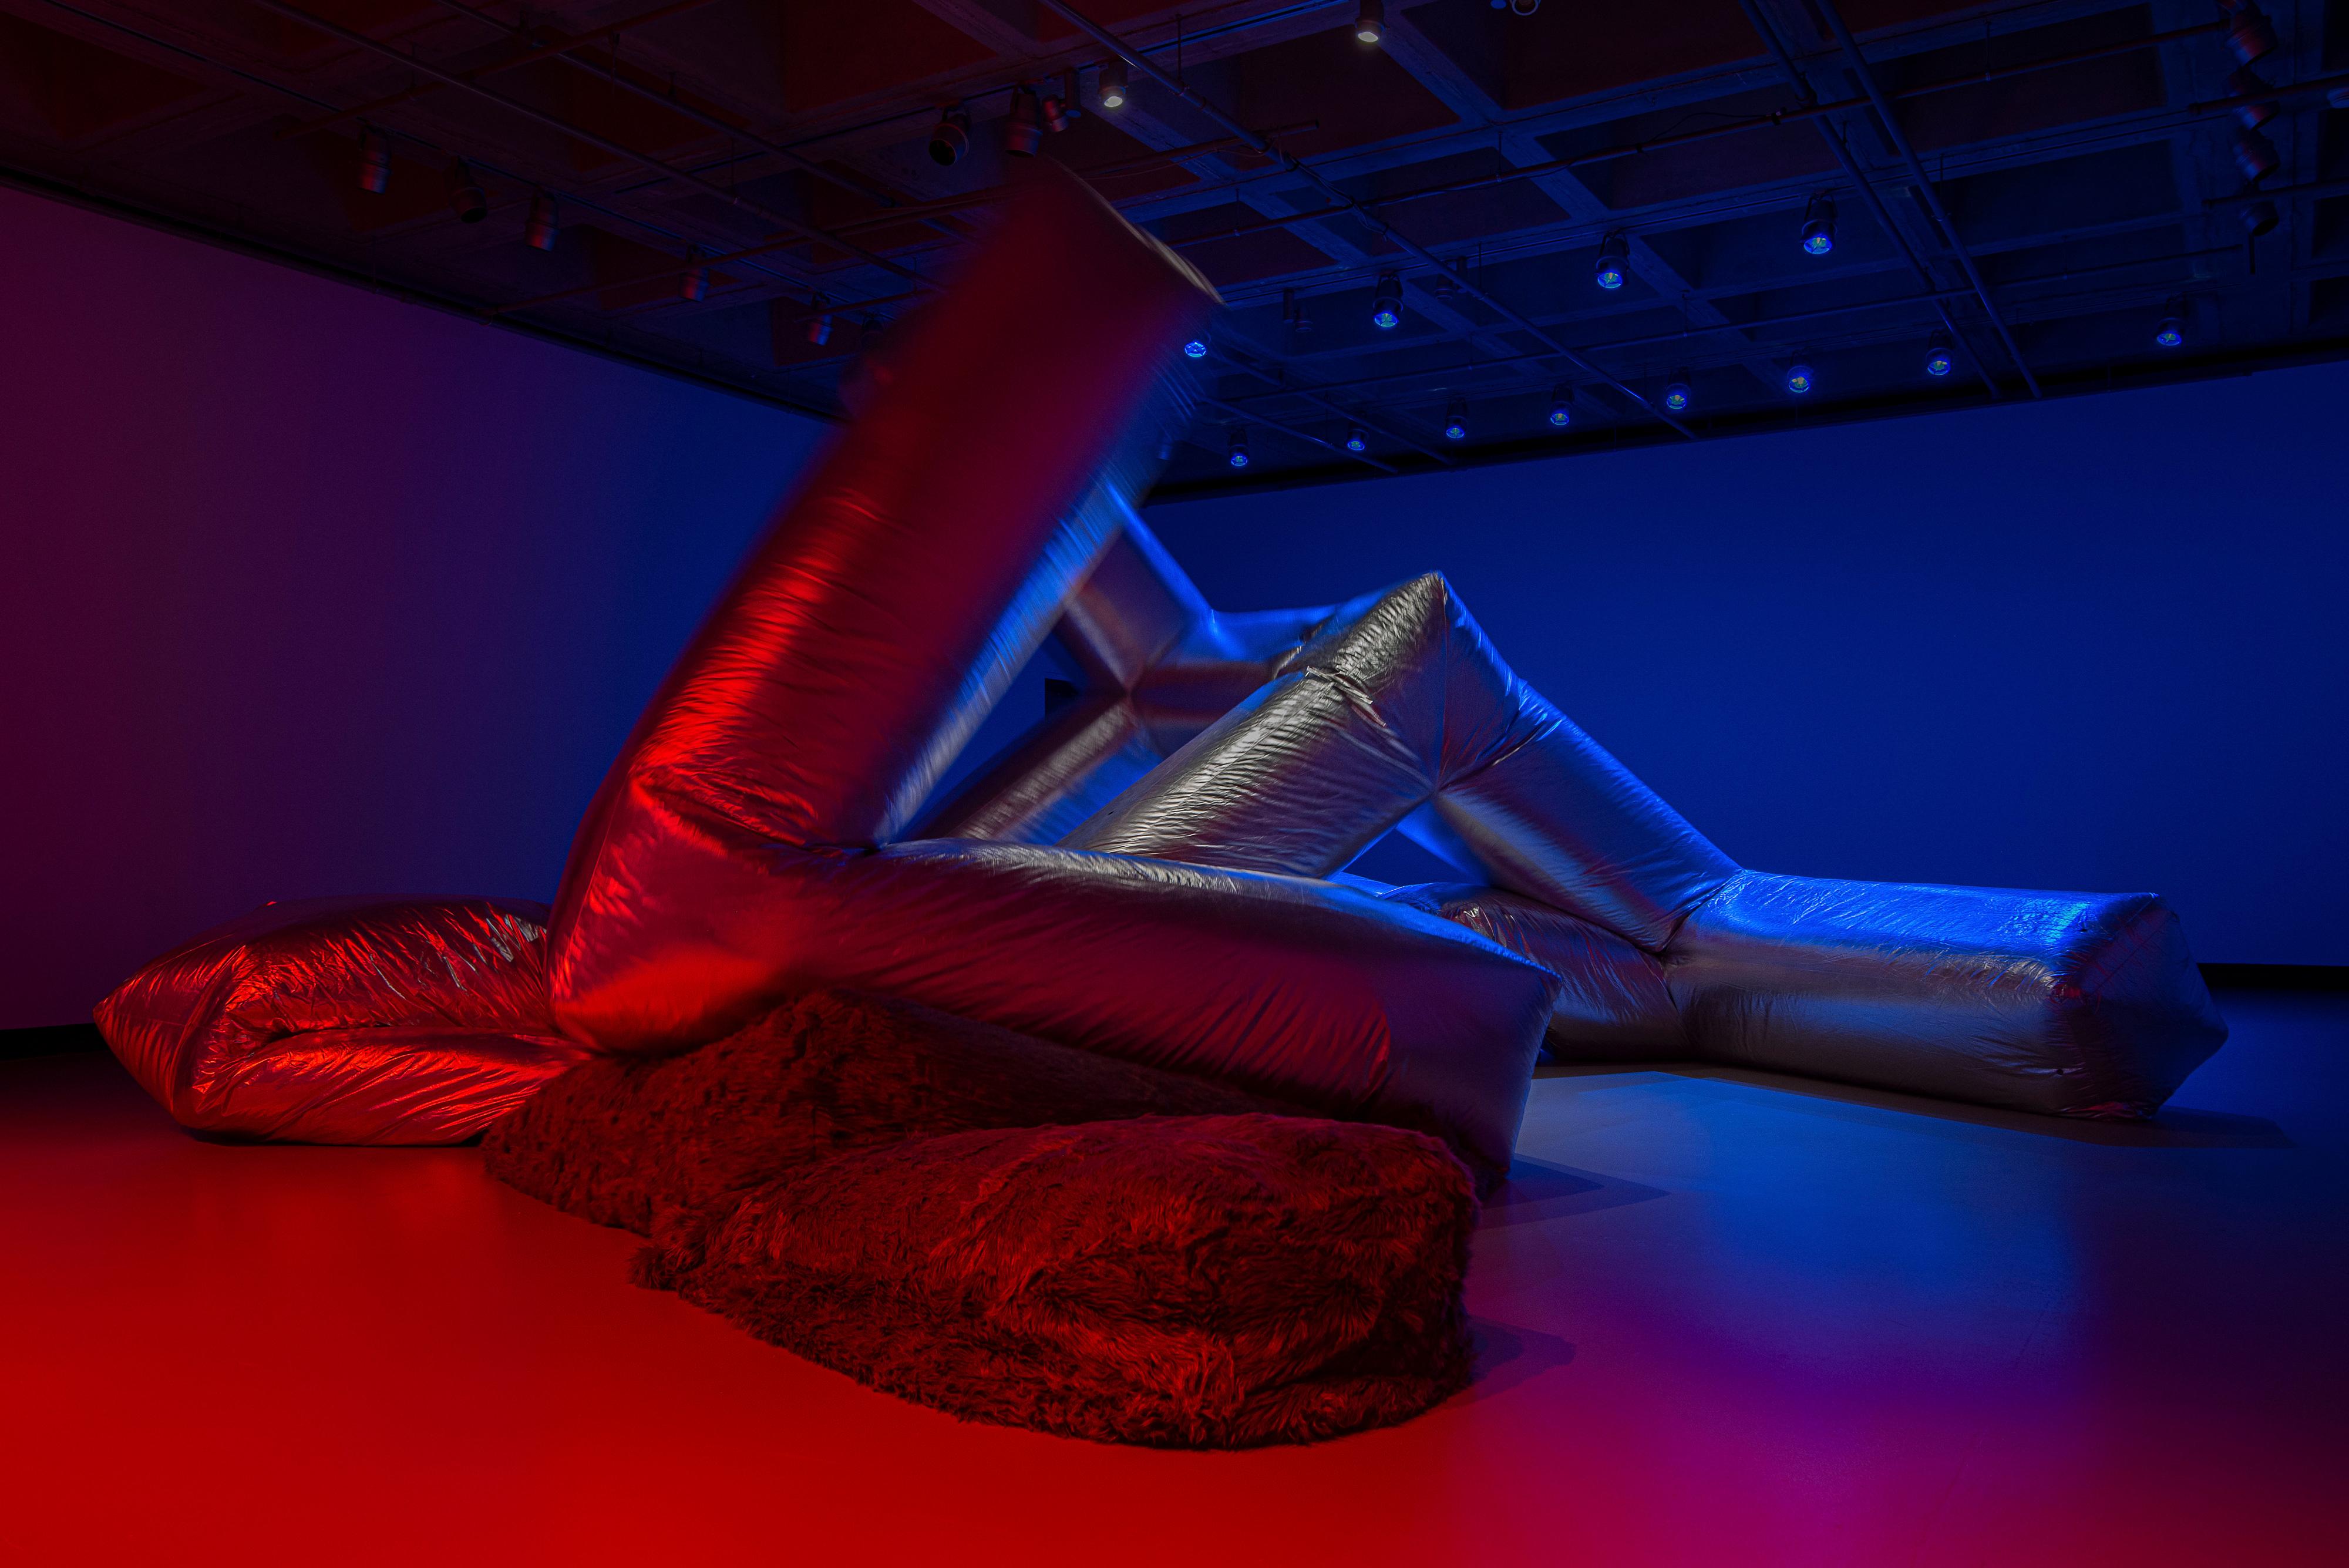 Galerie Barbara Thumm \ Alex Schweder, The Sound And The Future, Colgate University, 2021